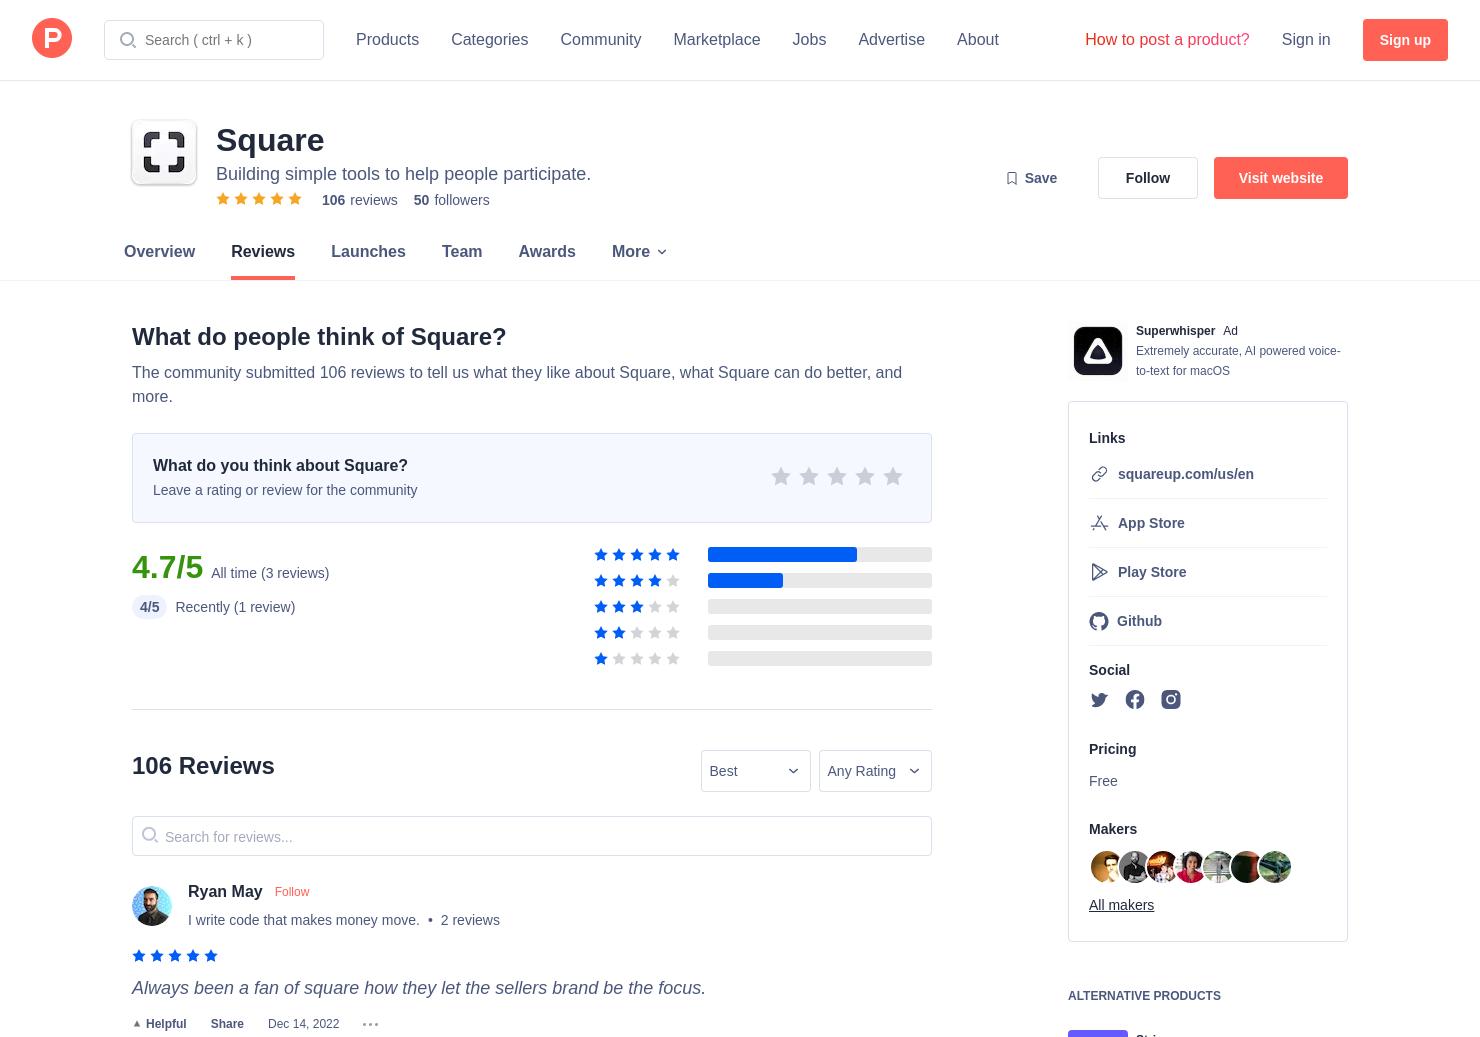 Square Flutter Plug-in for Reader SDK Reviews - Pros, Cons